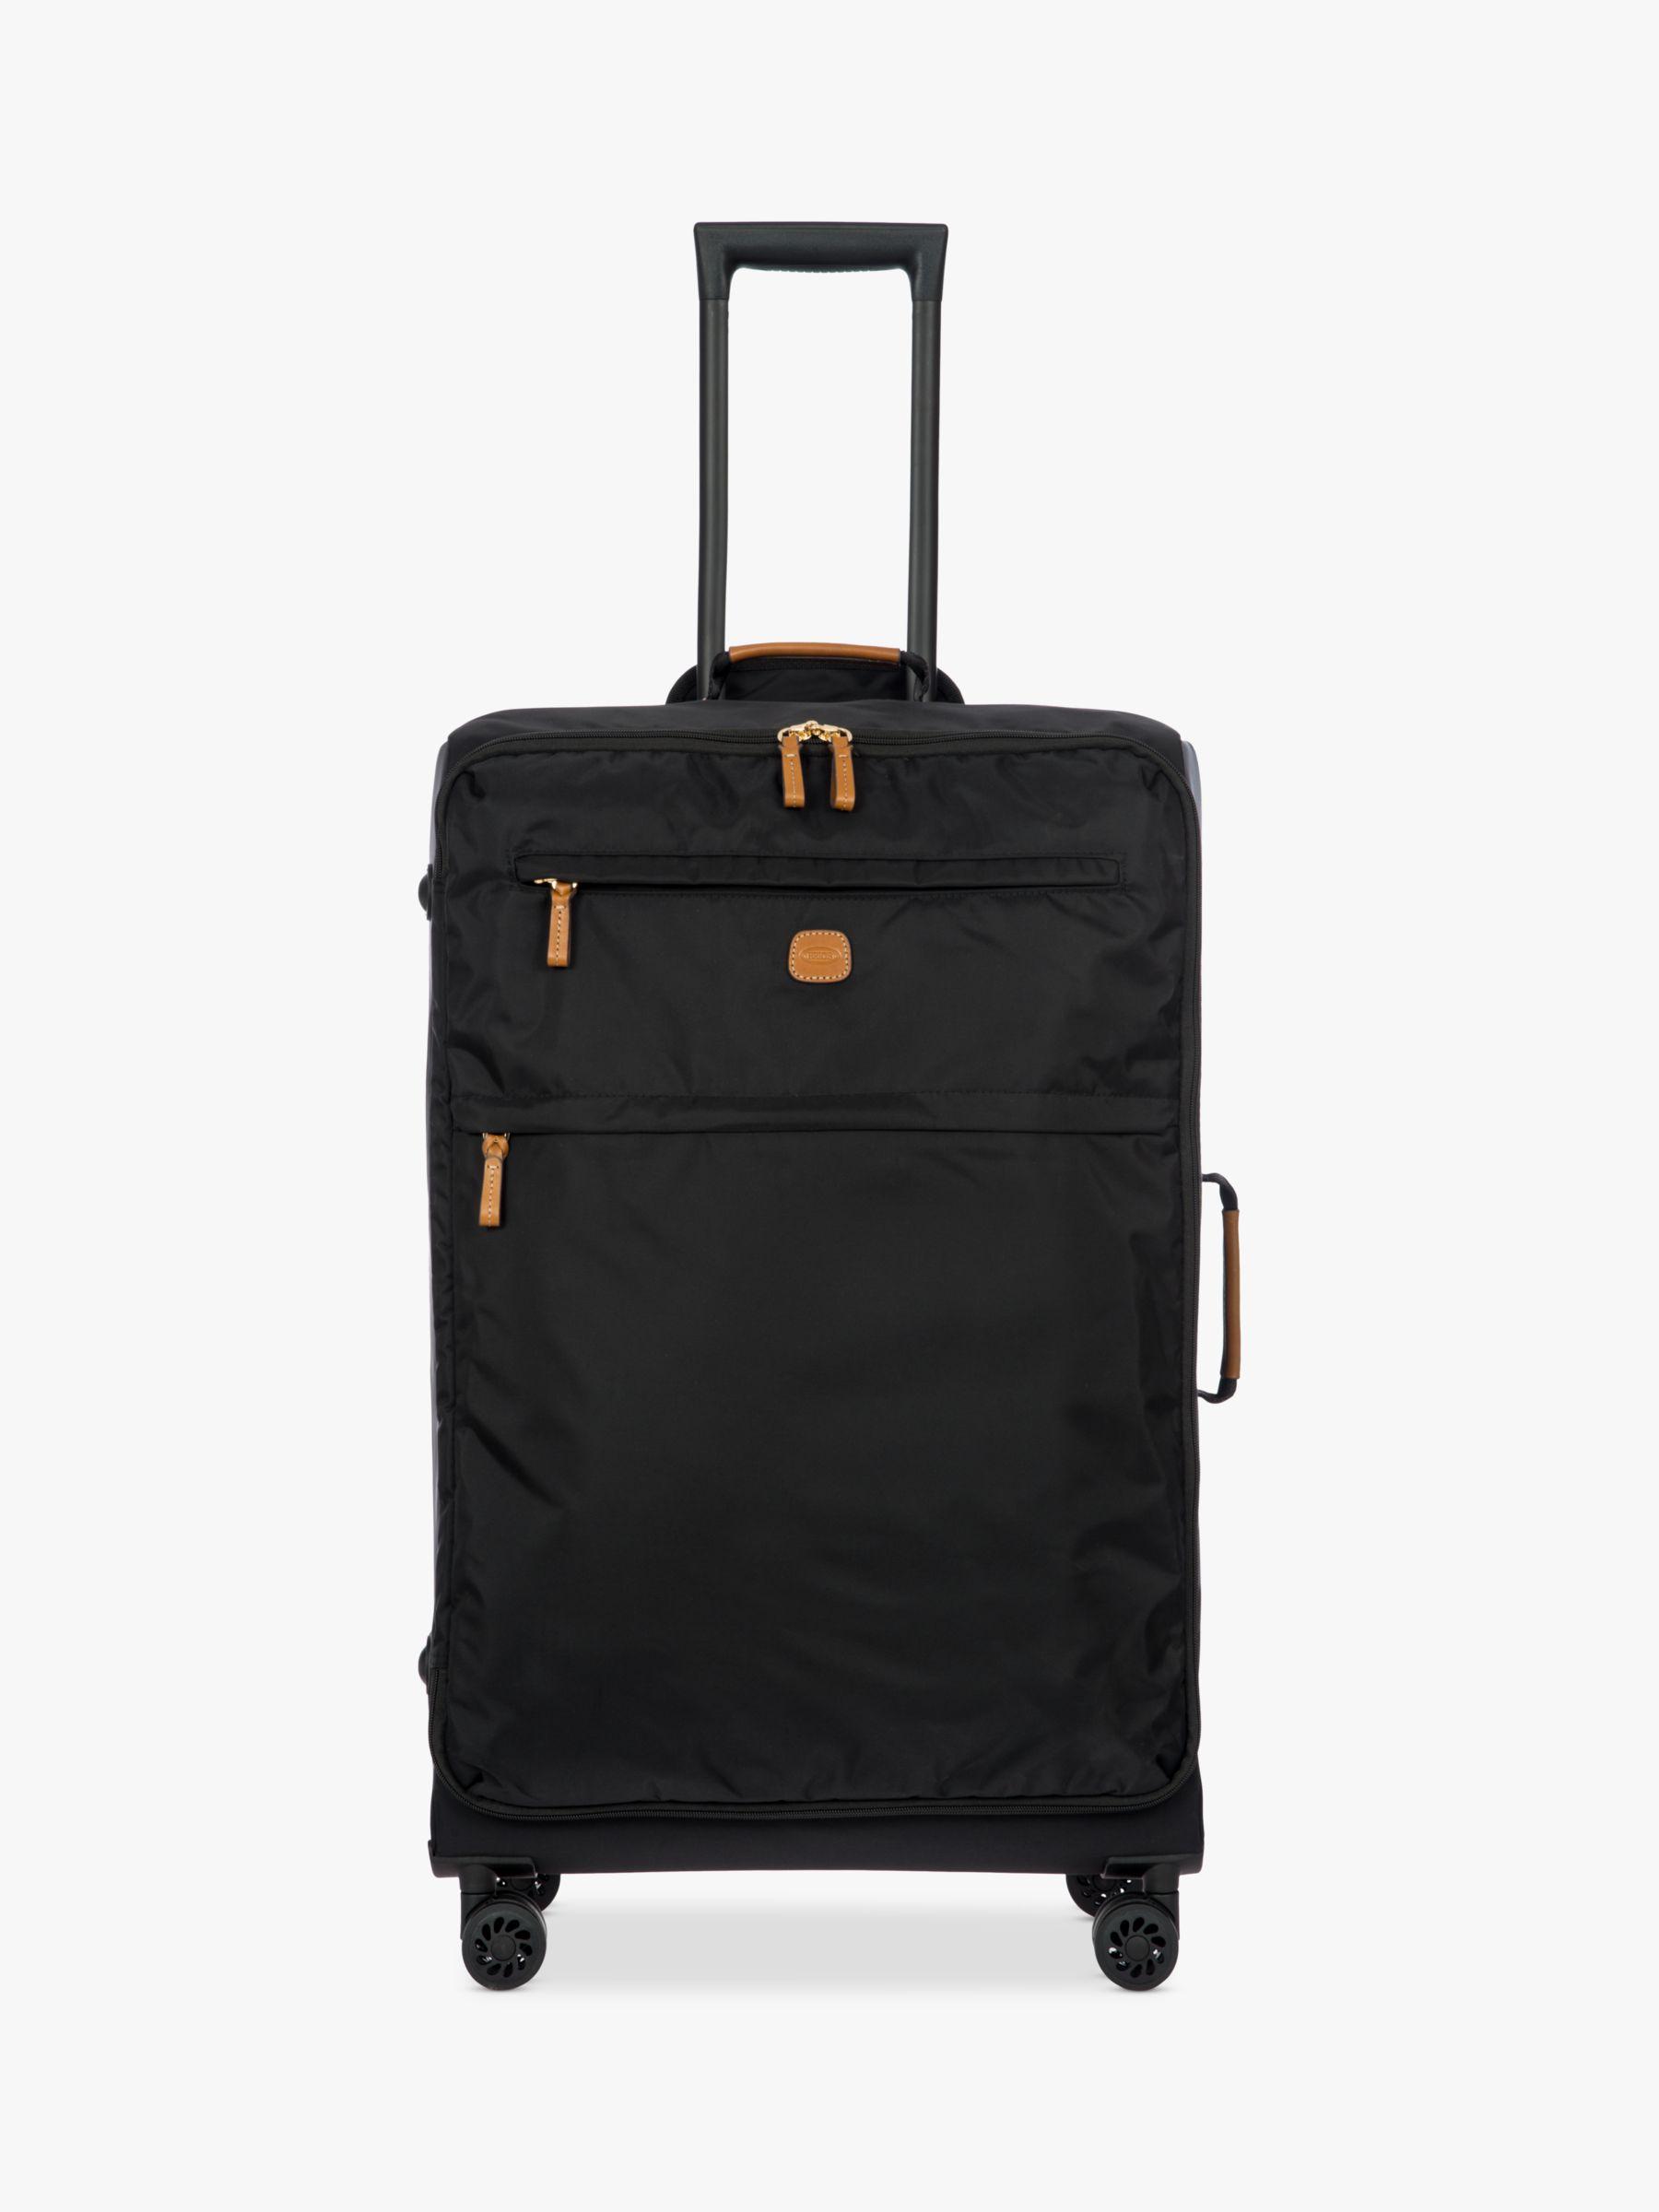 Bric's Bric's X Travel 77cm 4-Wheel Large Suitcase, Black